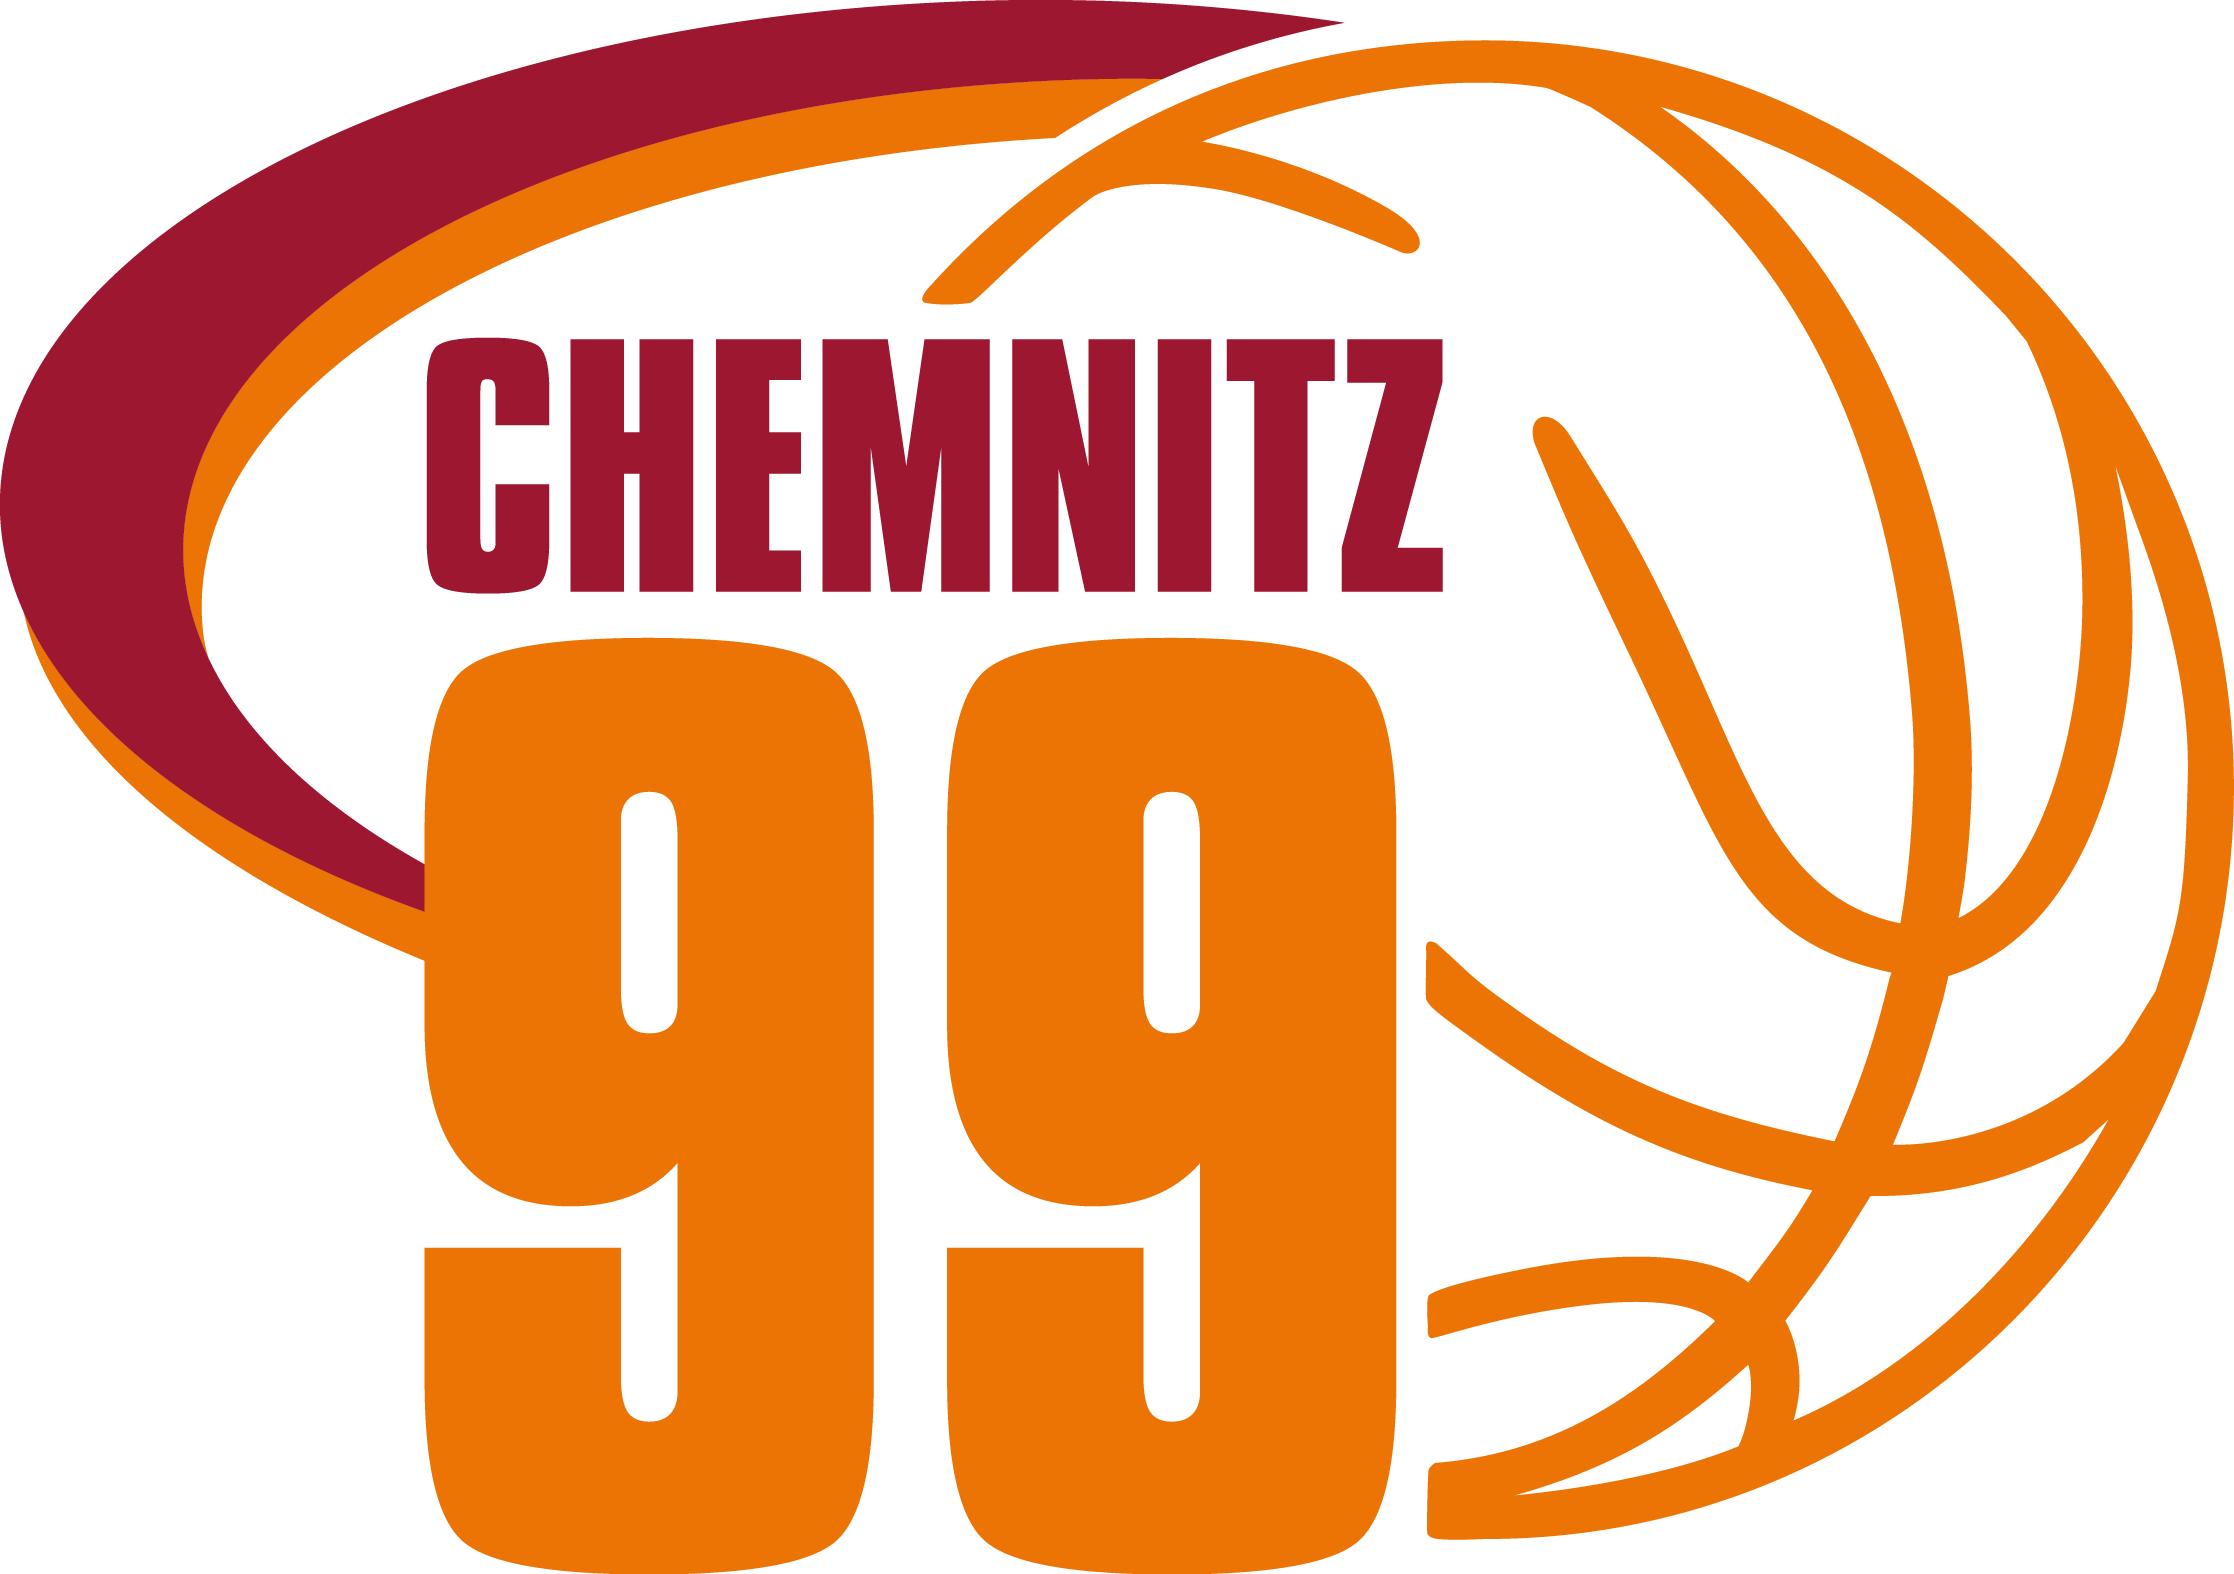 Image for MLP Academics Heidelberg vs. NINERS Chemnitz